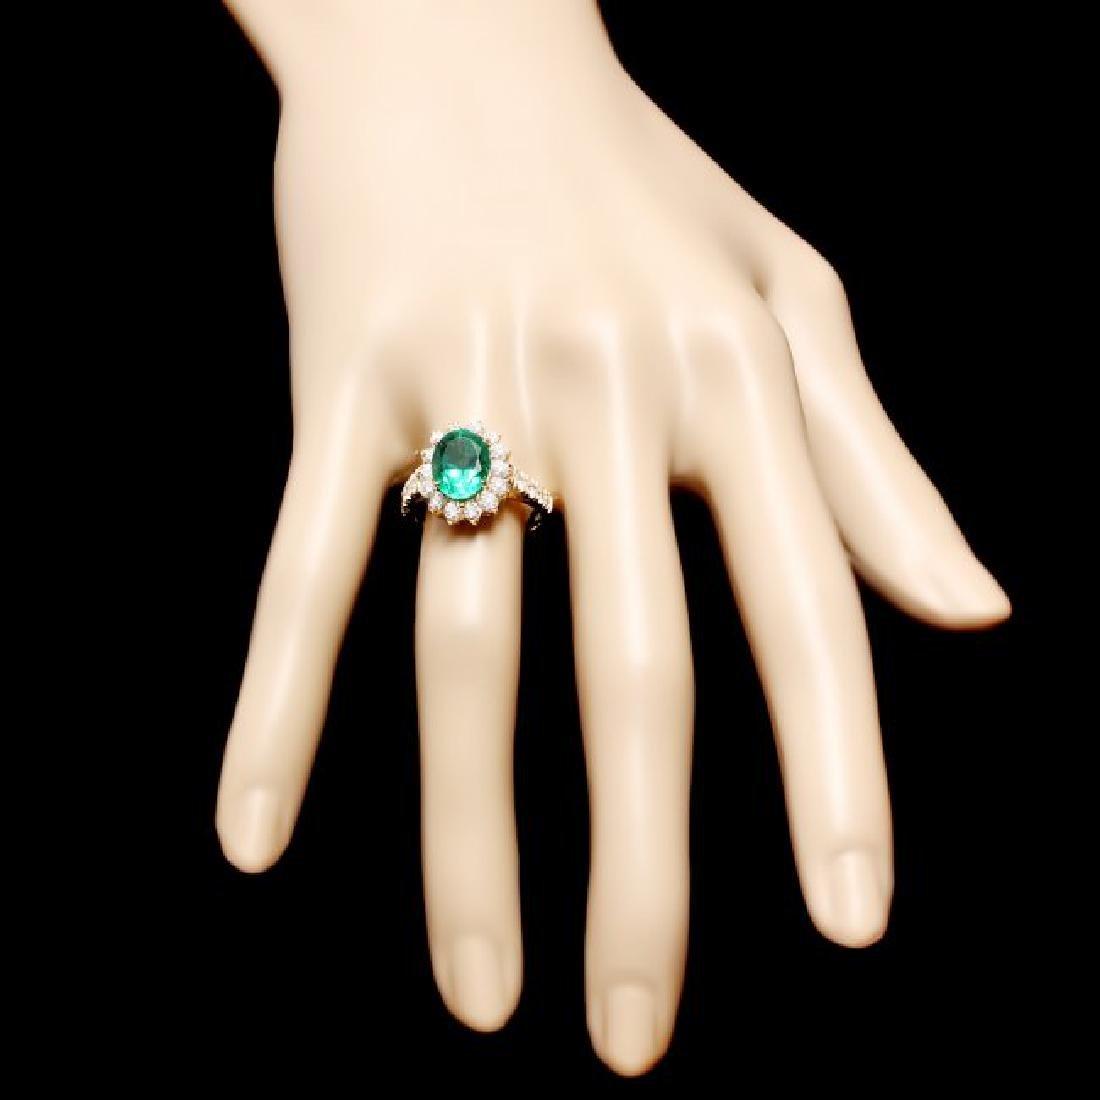 14k Gold 2.65ct Emerald 1.10ct Diamond Ring - 4